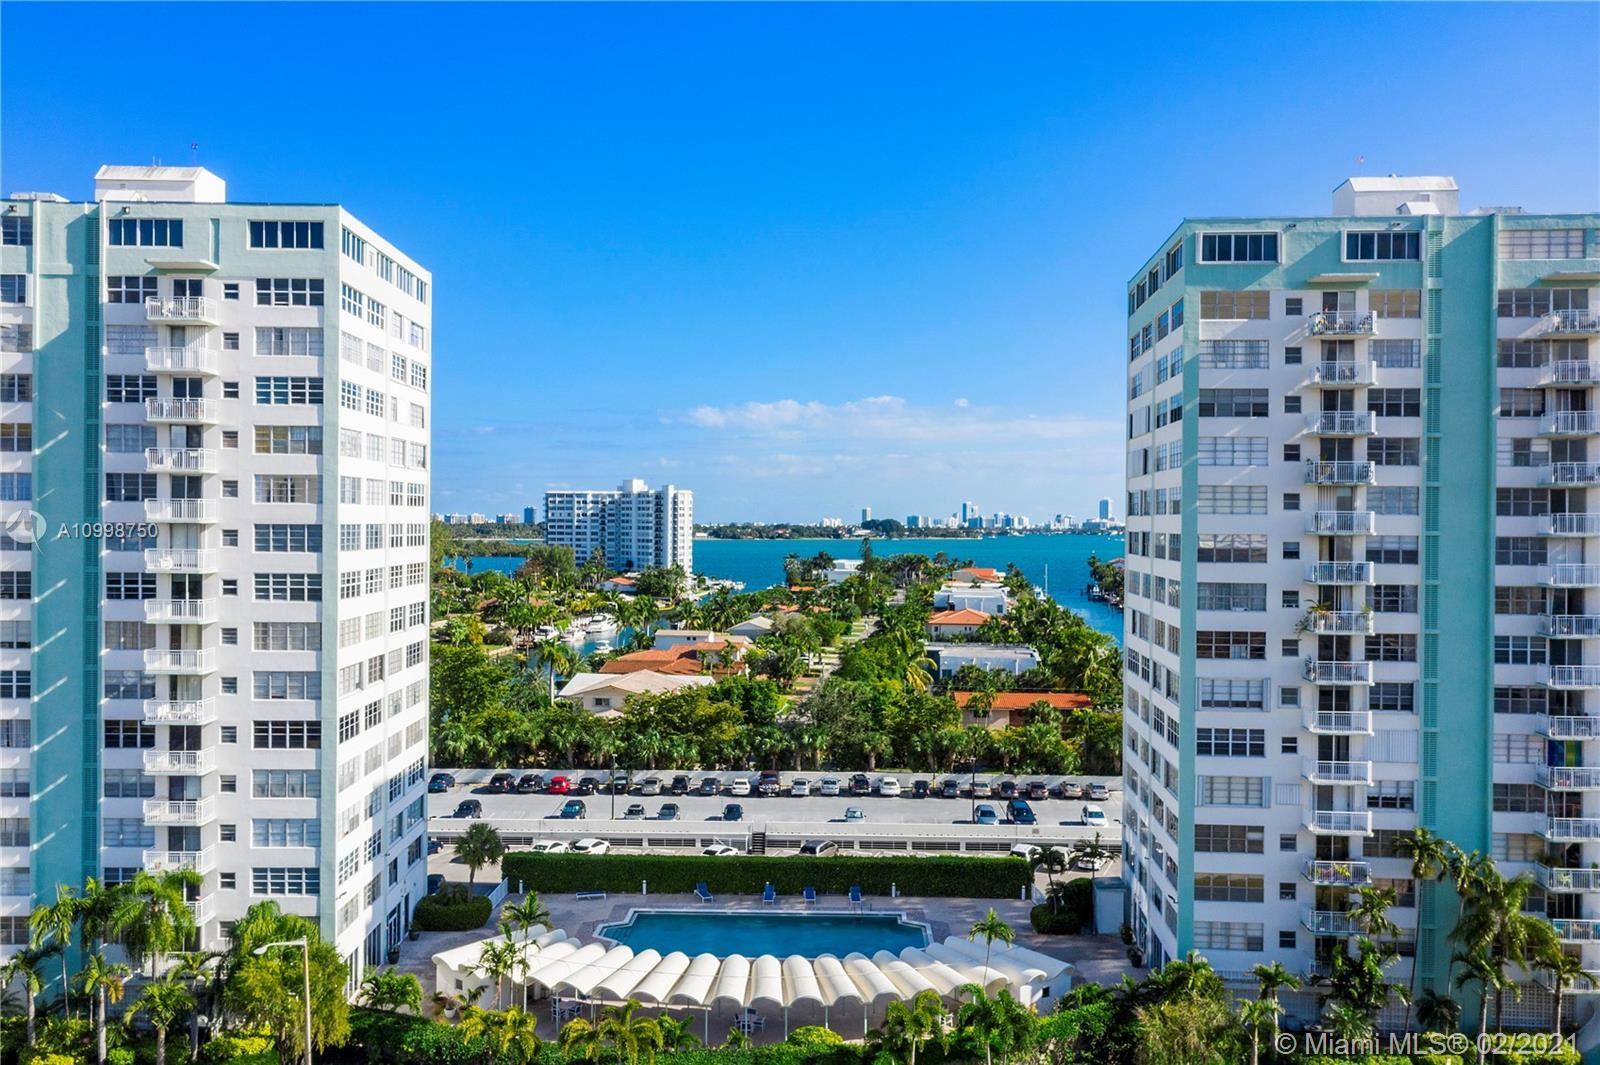 Photo of 2150 Sans Souci Blvd #B811, North Miami, FL 33181 (MLS # A10998750)